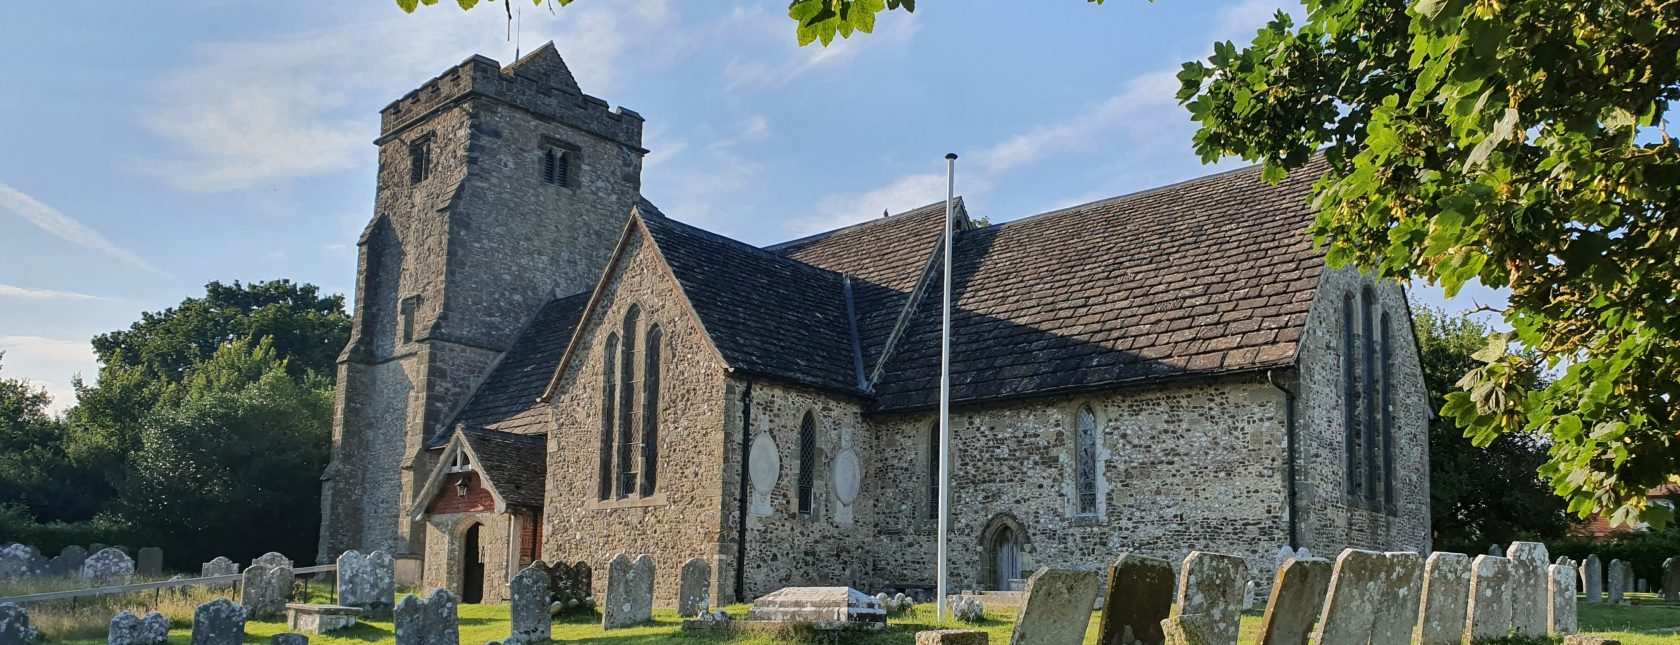 St Mary's Church Thakeham